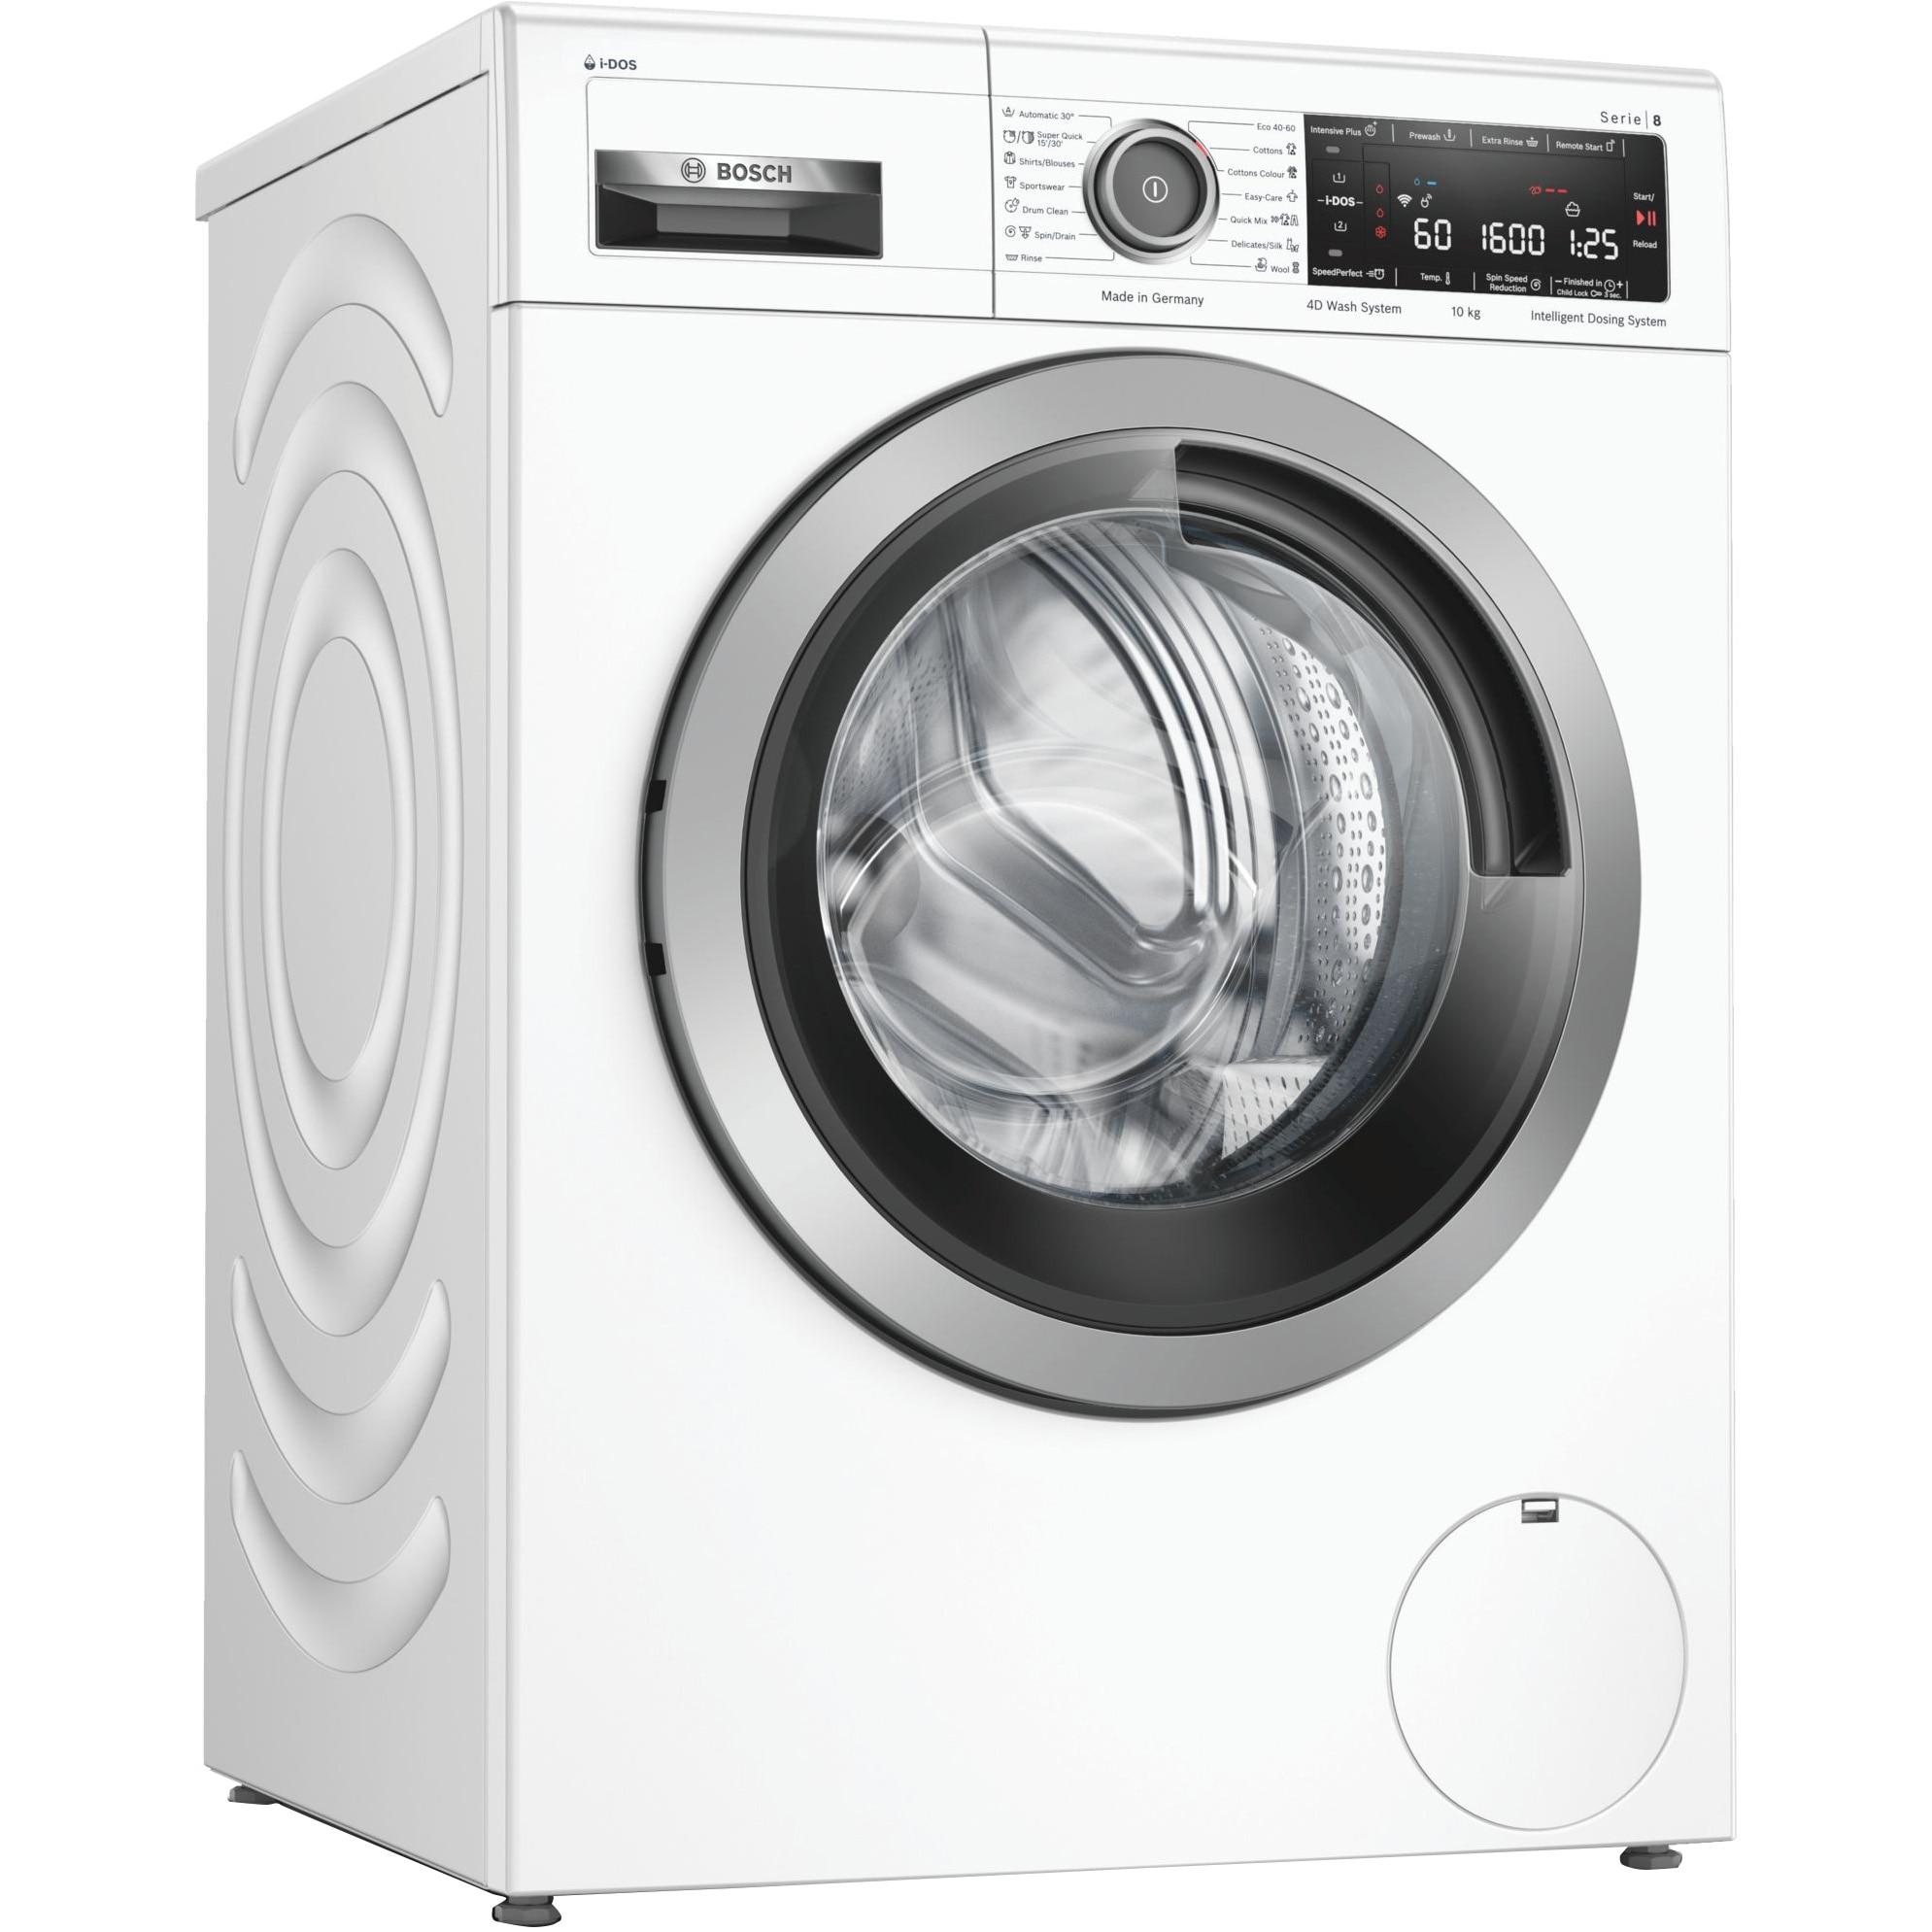 Fotografie Masina de spalat rufe Bosch WAX32KH1BY, 10 kg, 1600 RPM, Clasa C, Home Connect, i-DOS, EcoSilence Drive, Super Quick 30, Alb